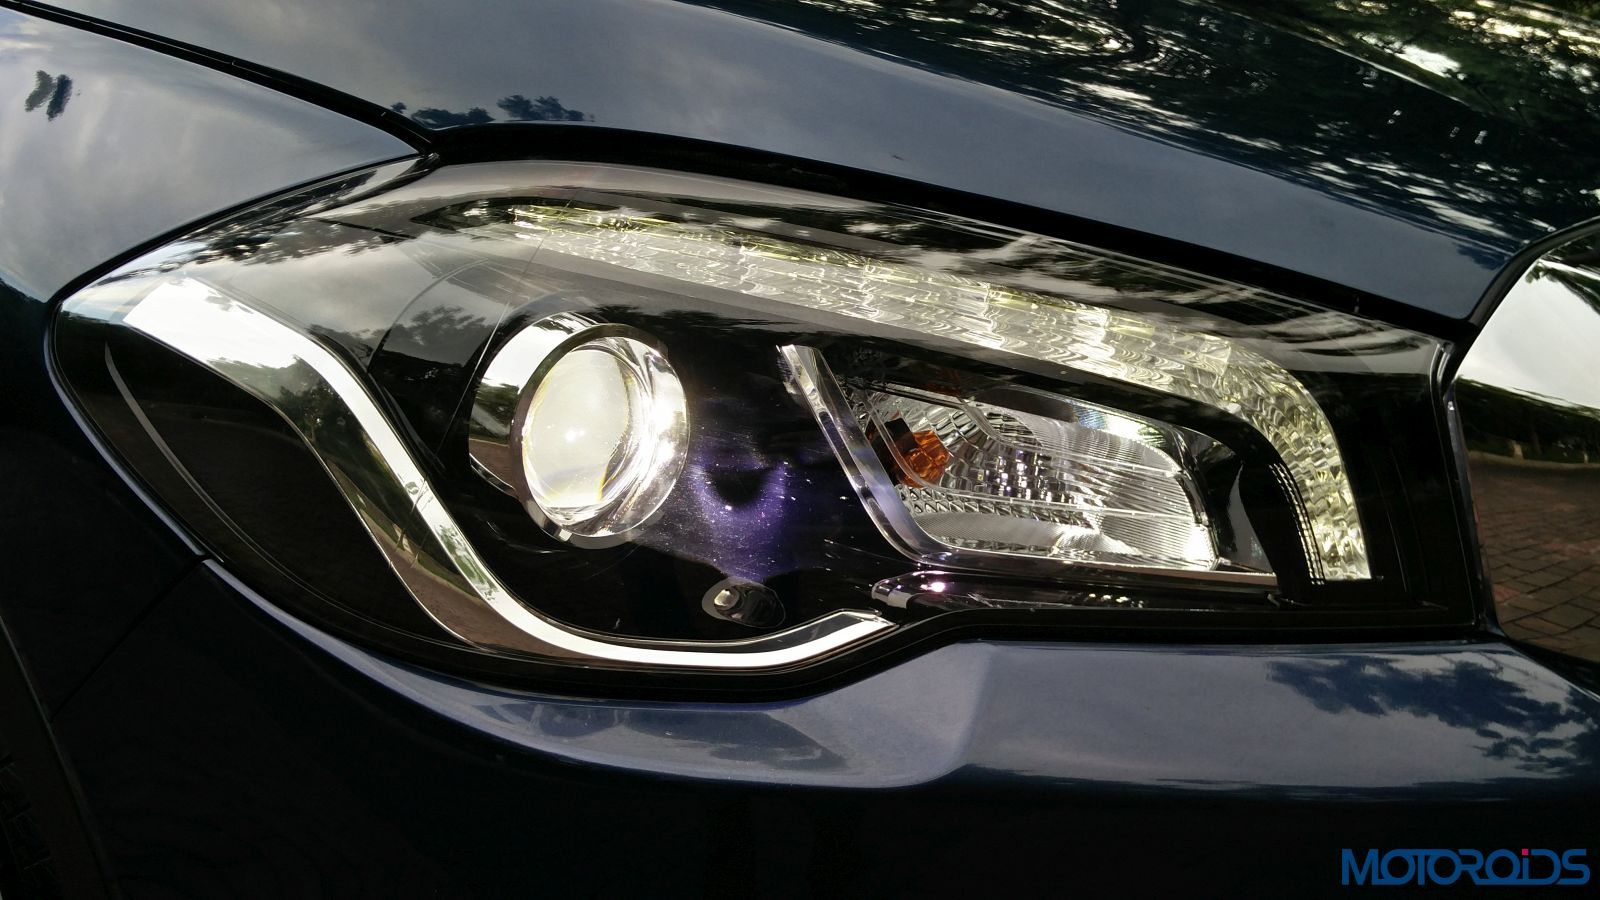 New-Maruti-Suzuki-S-Cross-Alpha-Review-static-images26